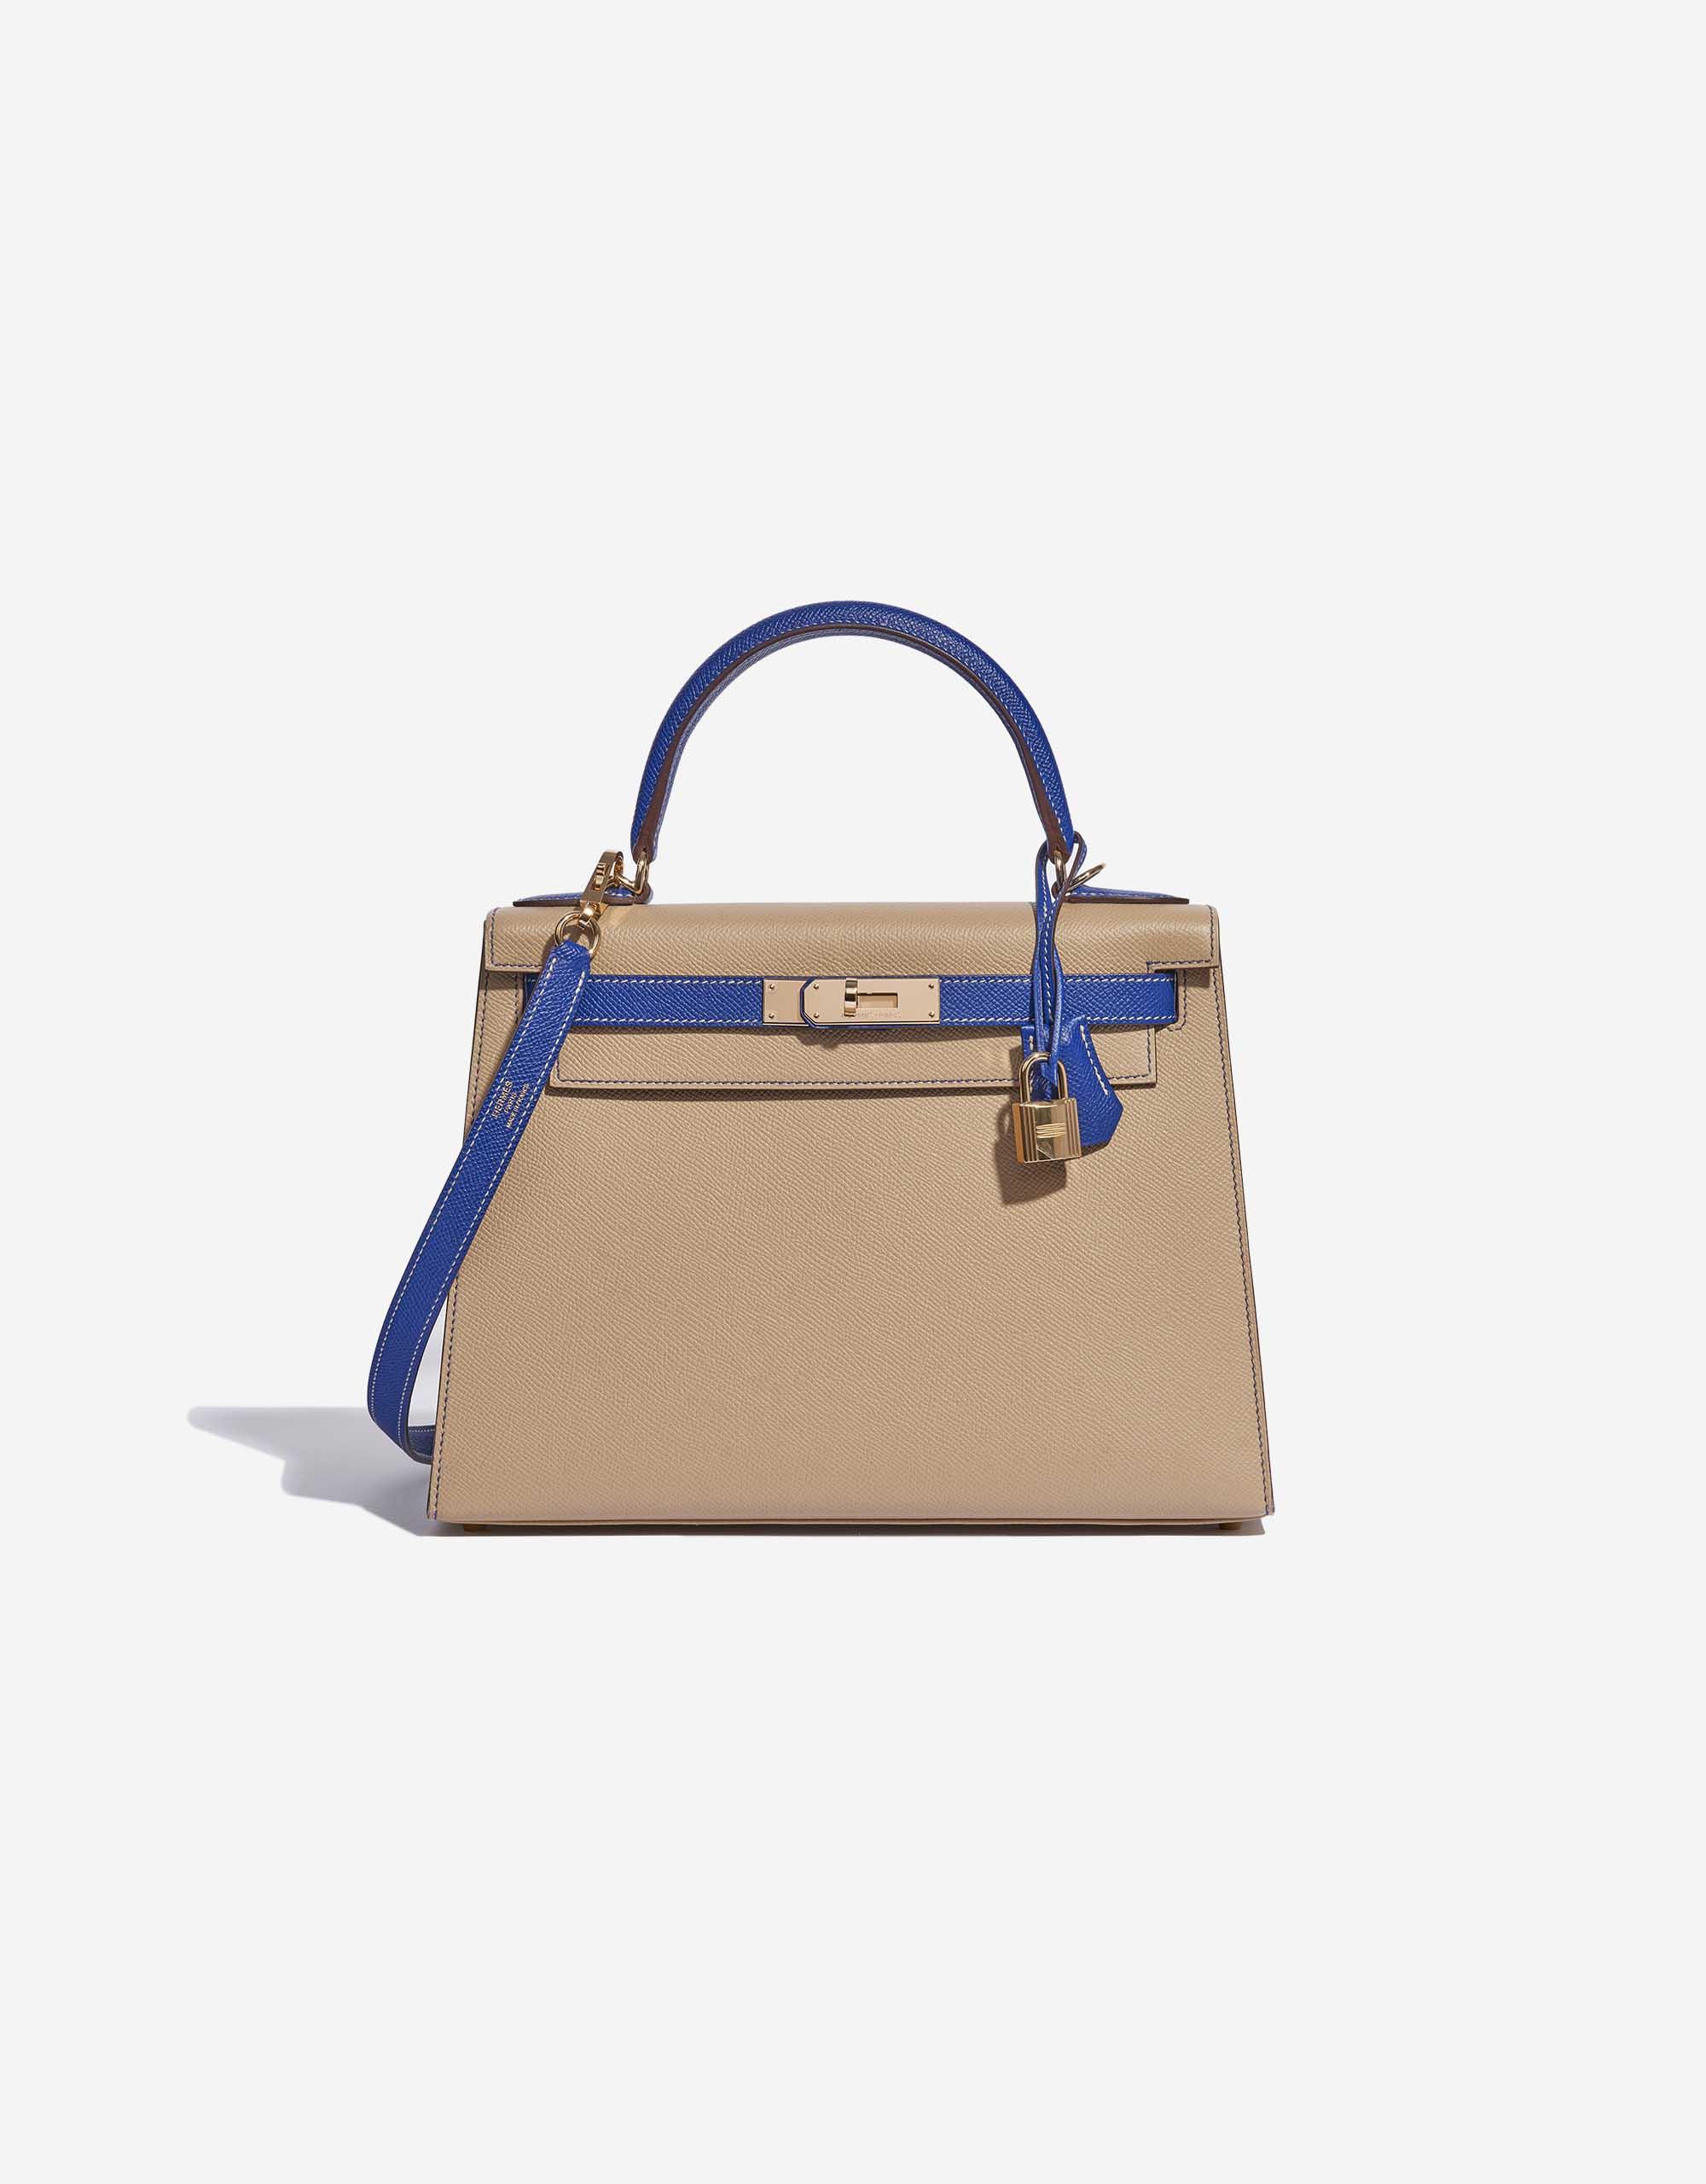 Hermès Kelly 28 HSS Epsom Trench / Blue Electrique | SACLÀB